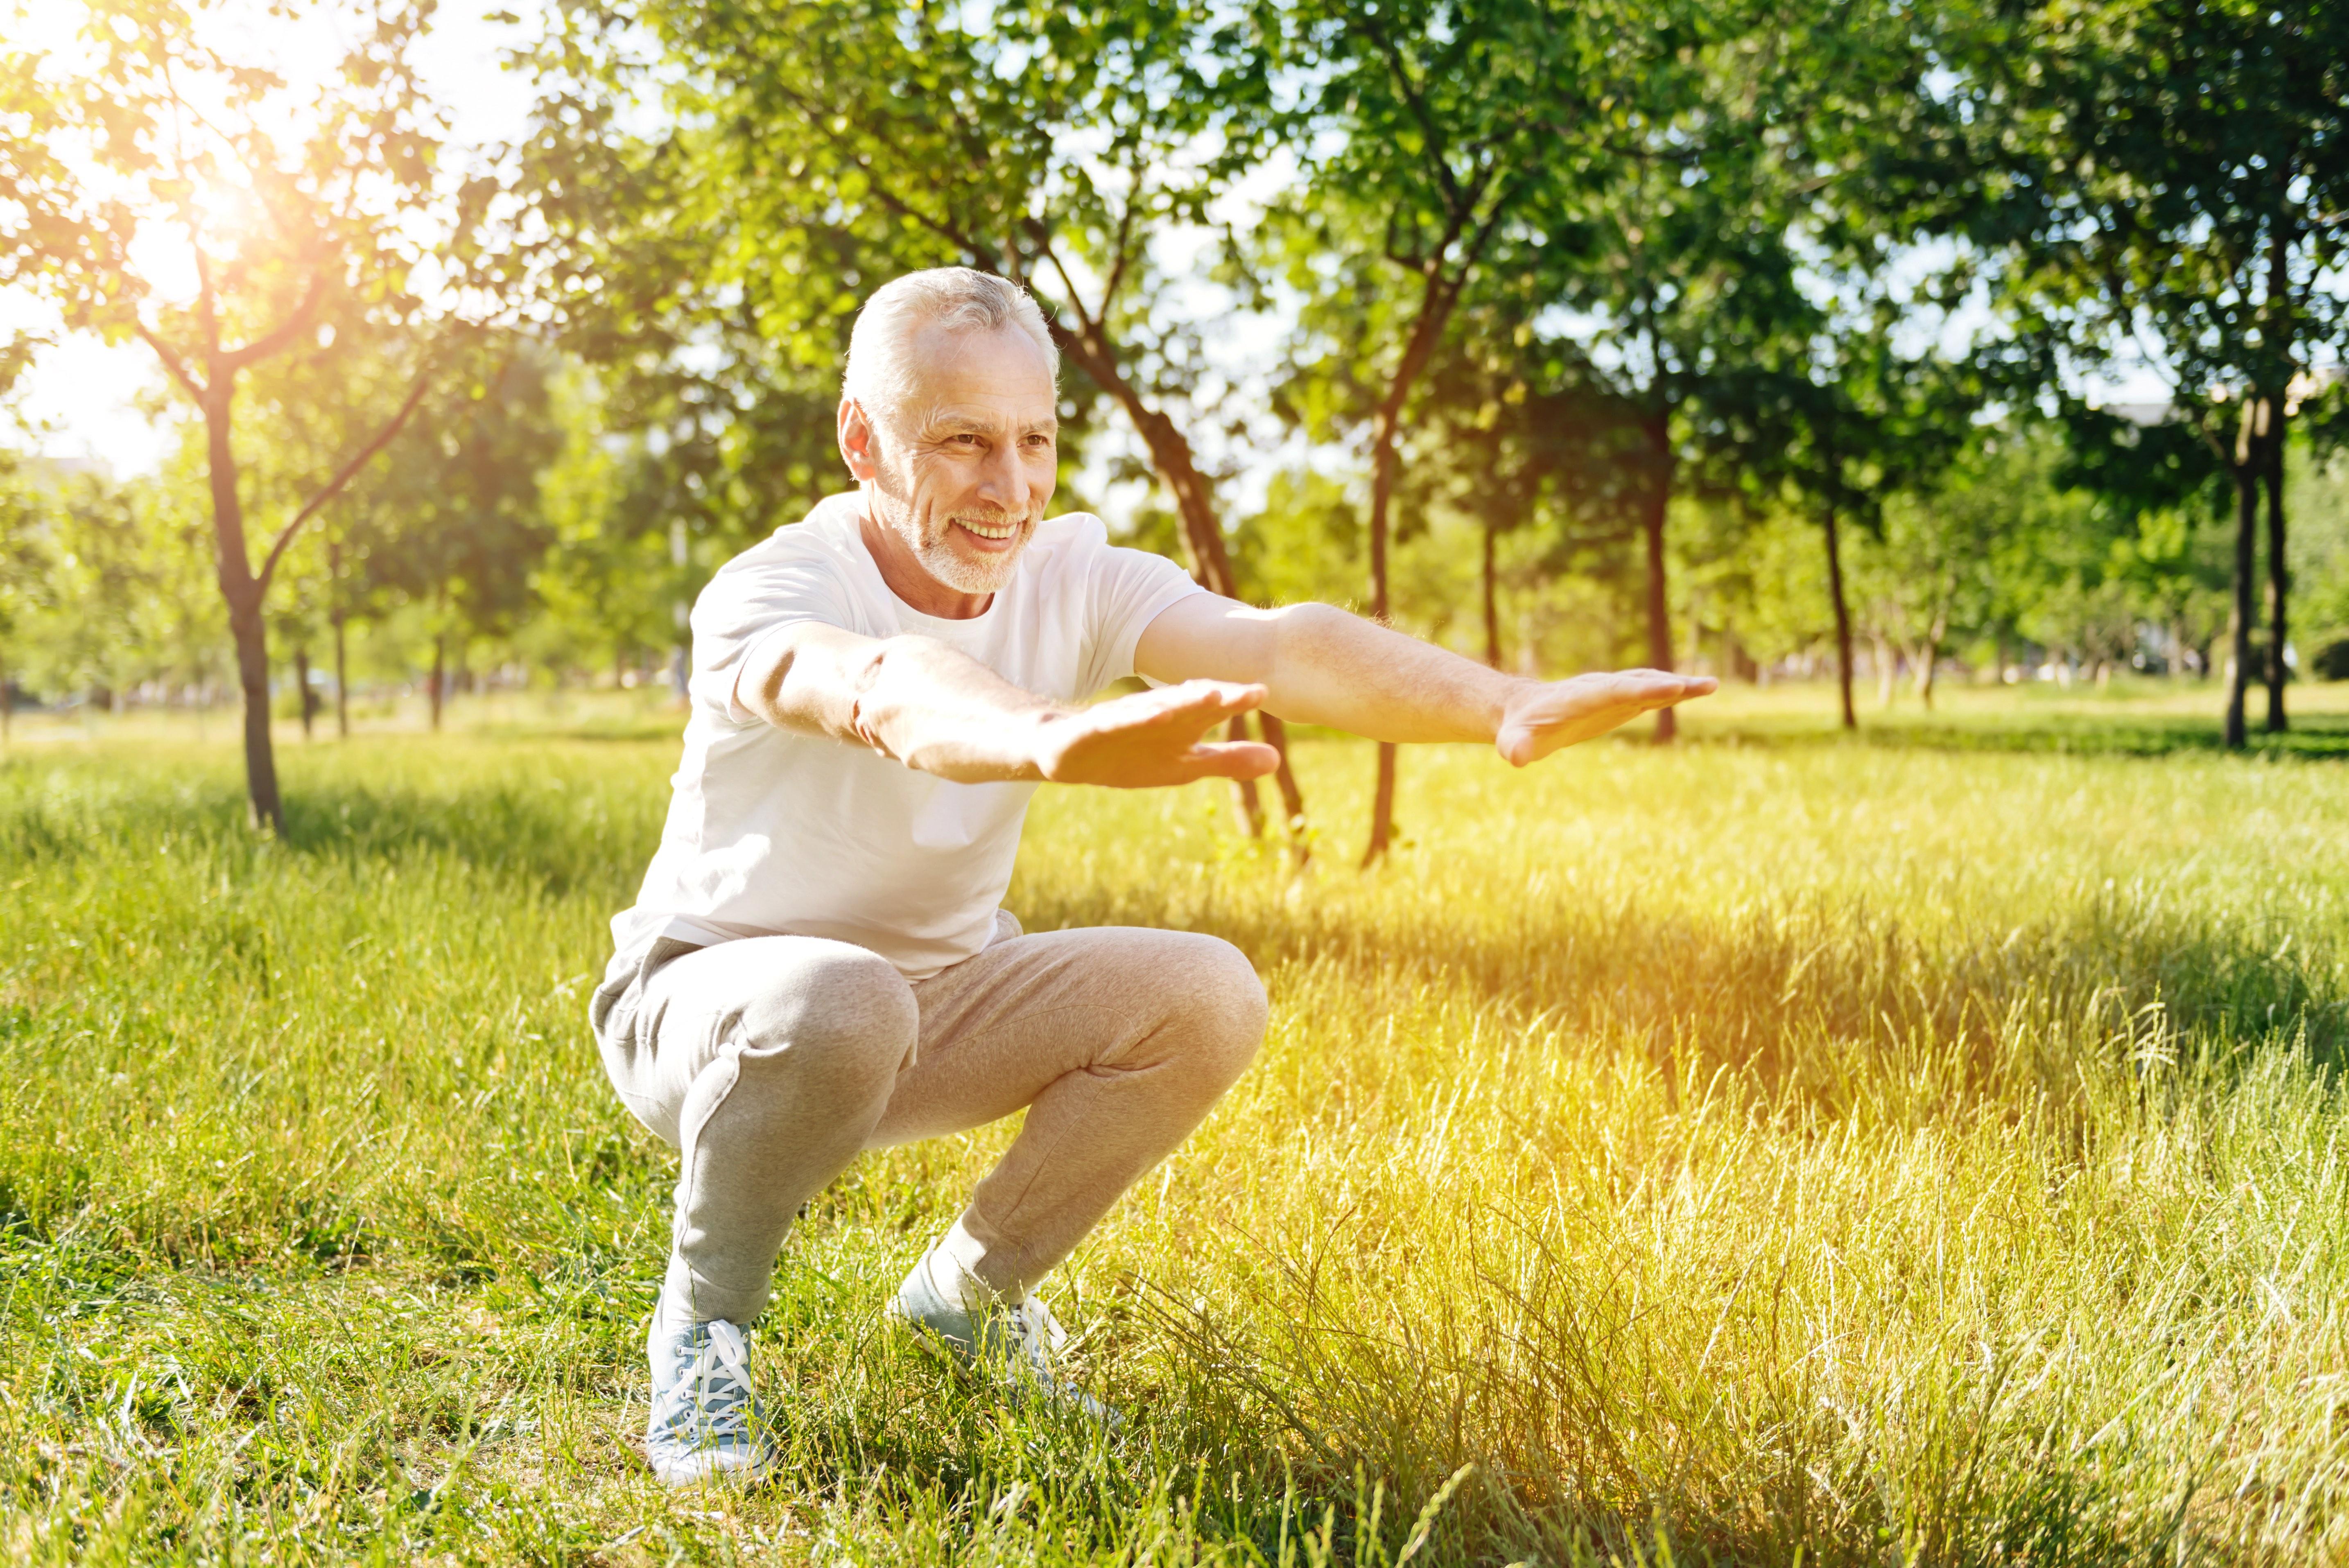 Senior Fitness Exercise Squat Elderly Outdoors Low Res